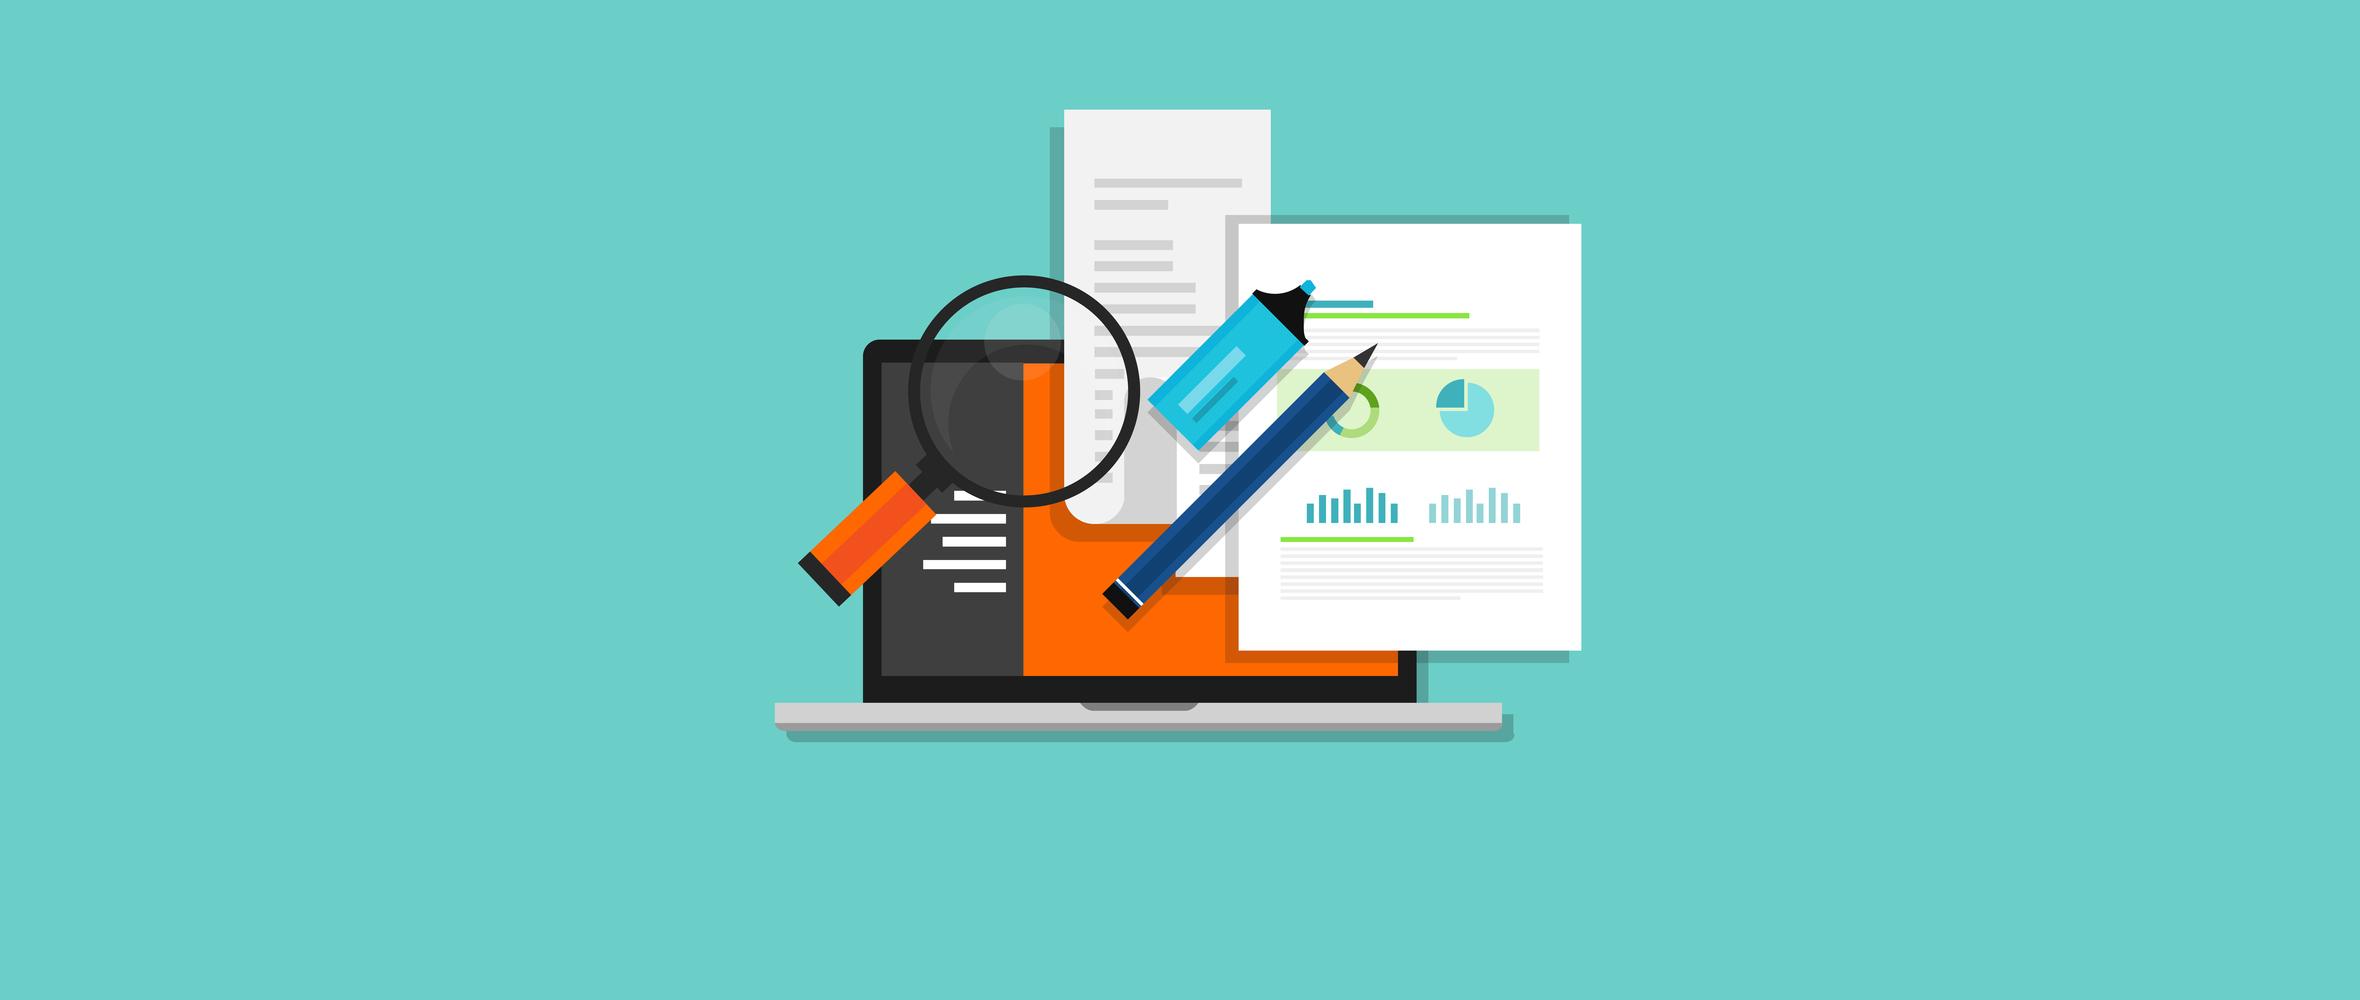 case study studies icon flat laptop magnifier learn analysis